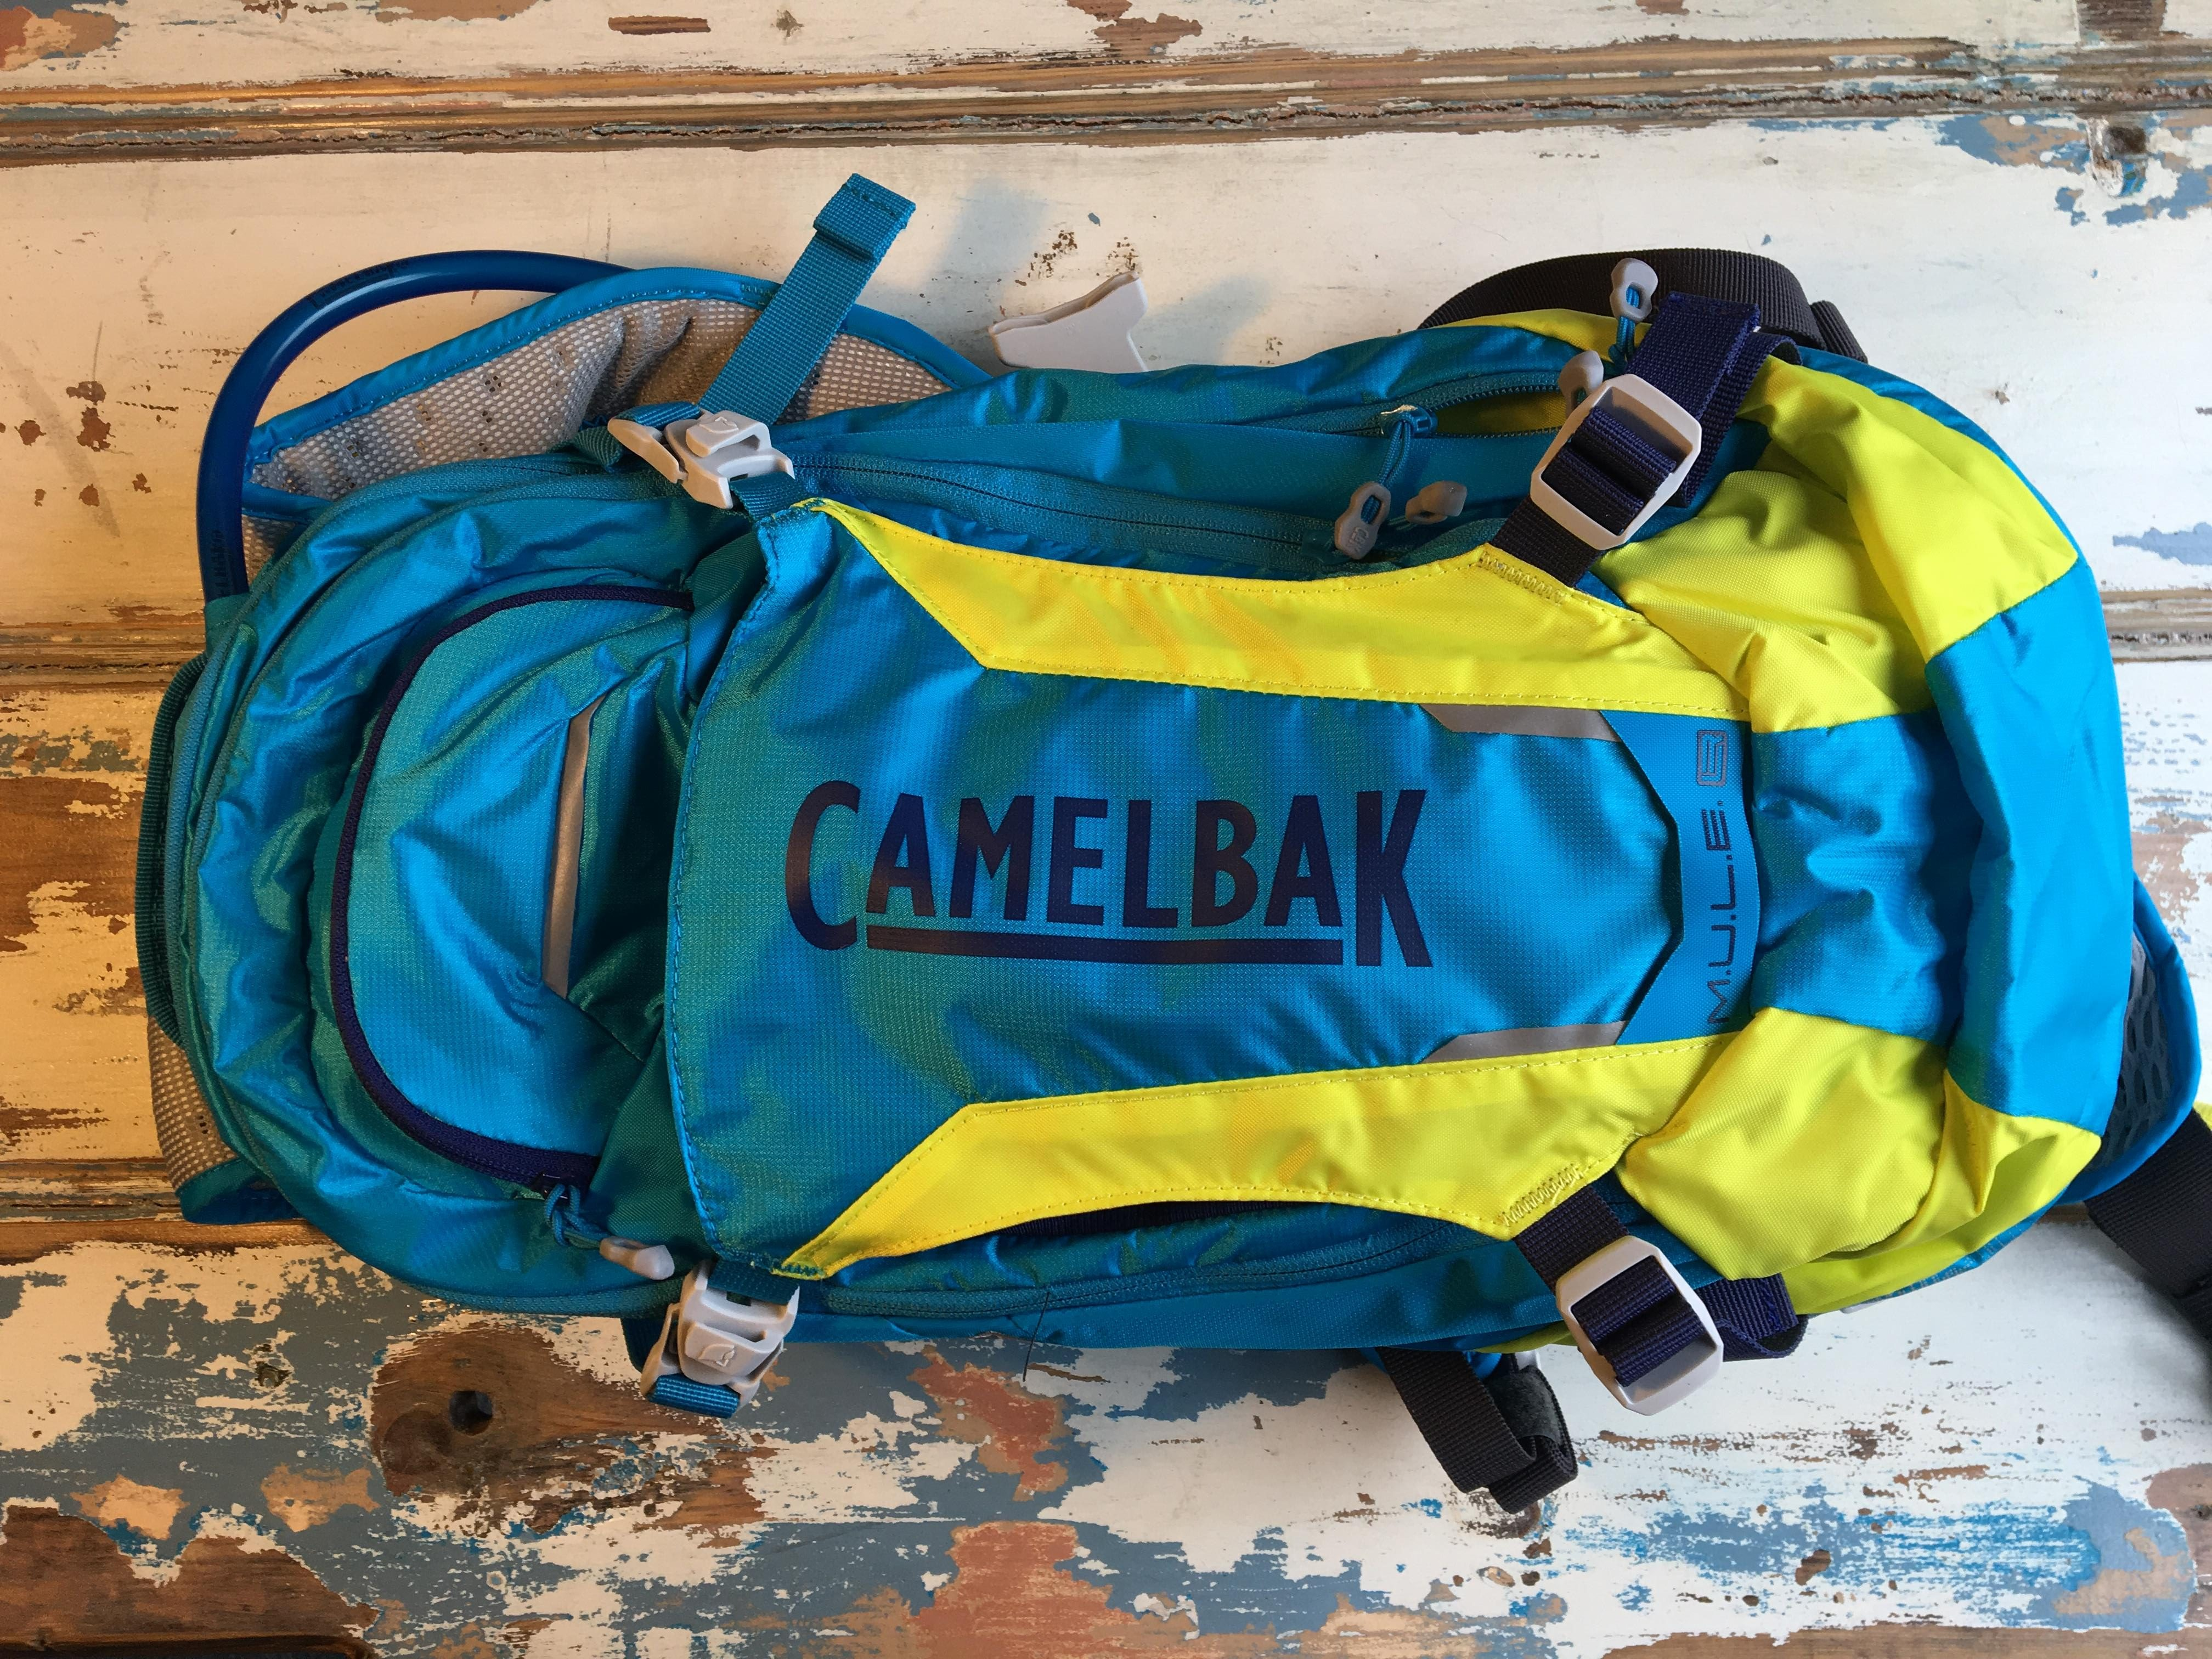 Camelbak M.U.L.E. LR15 £129.99. Latest fully loaded hydration pack b88bfe46325f4